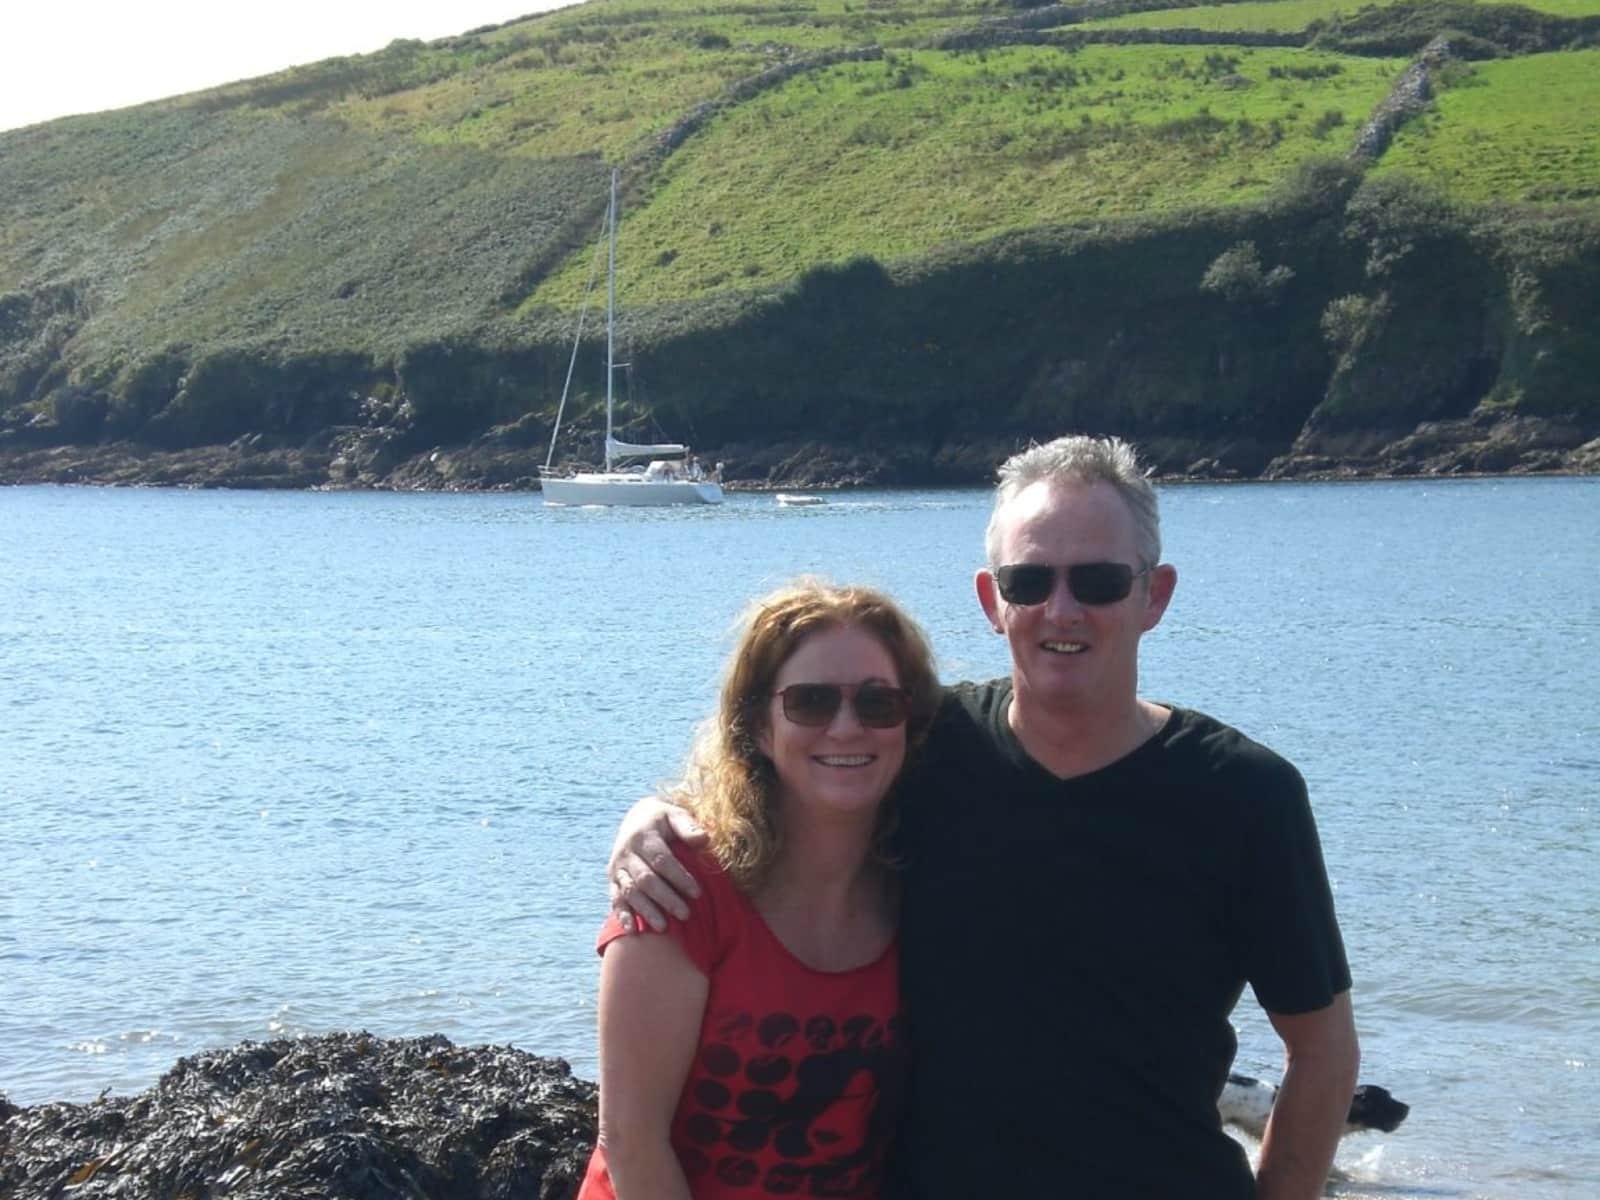 Colette & Joe from Limerick Junction, Ireland